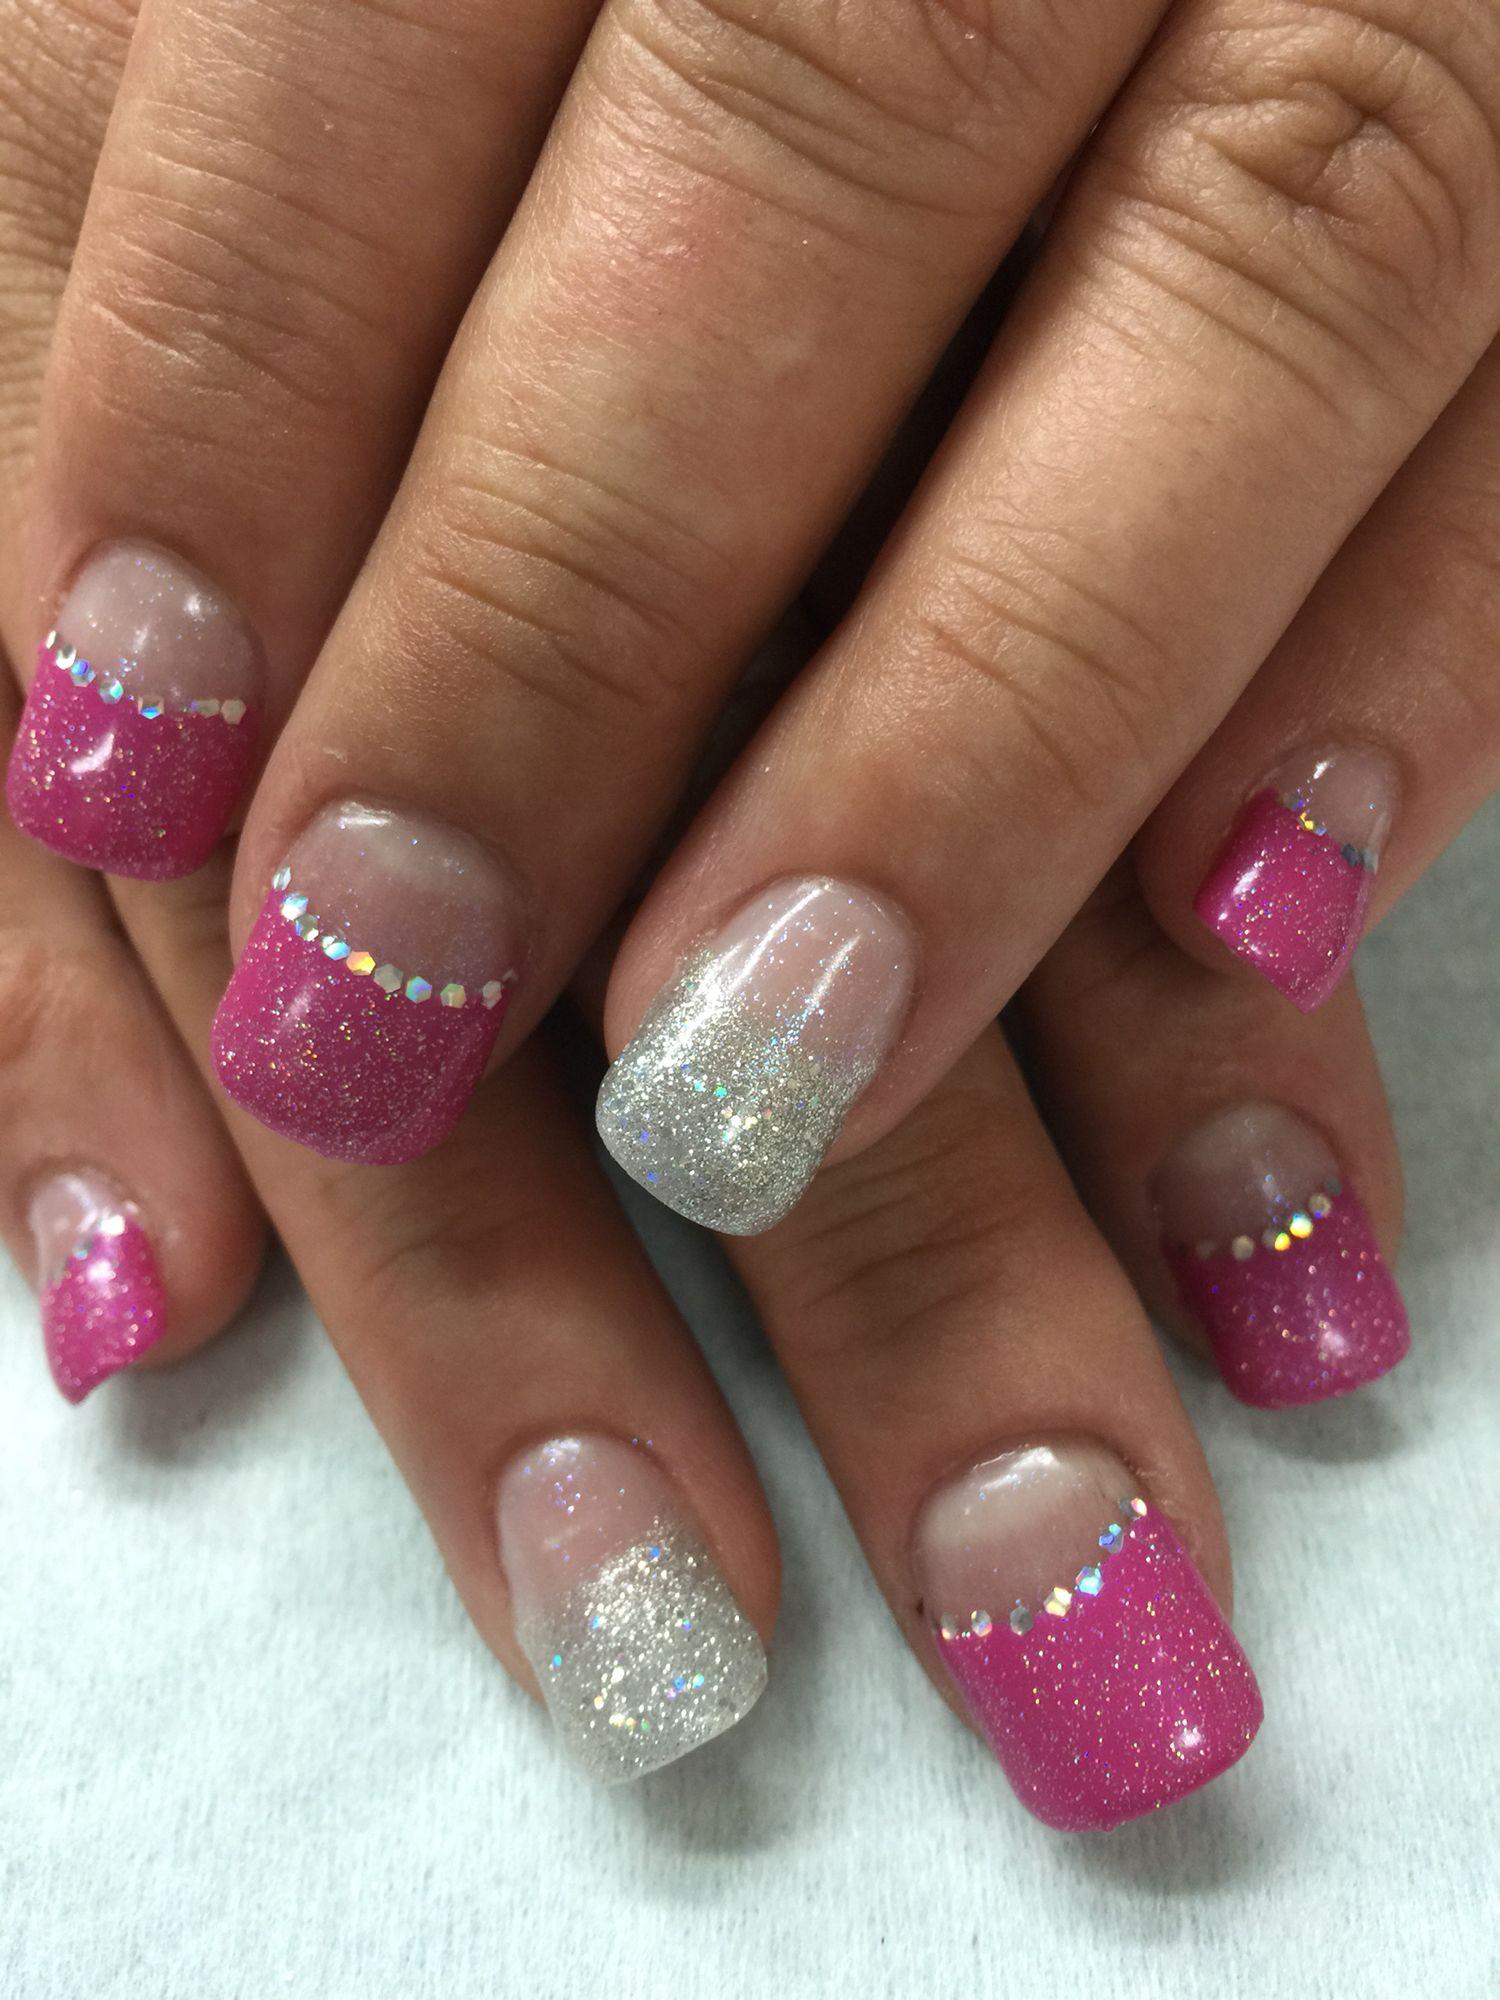 Sparkle, bling bridesmaid gel polish over non-toxic odorless hard ...